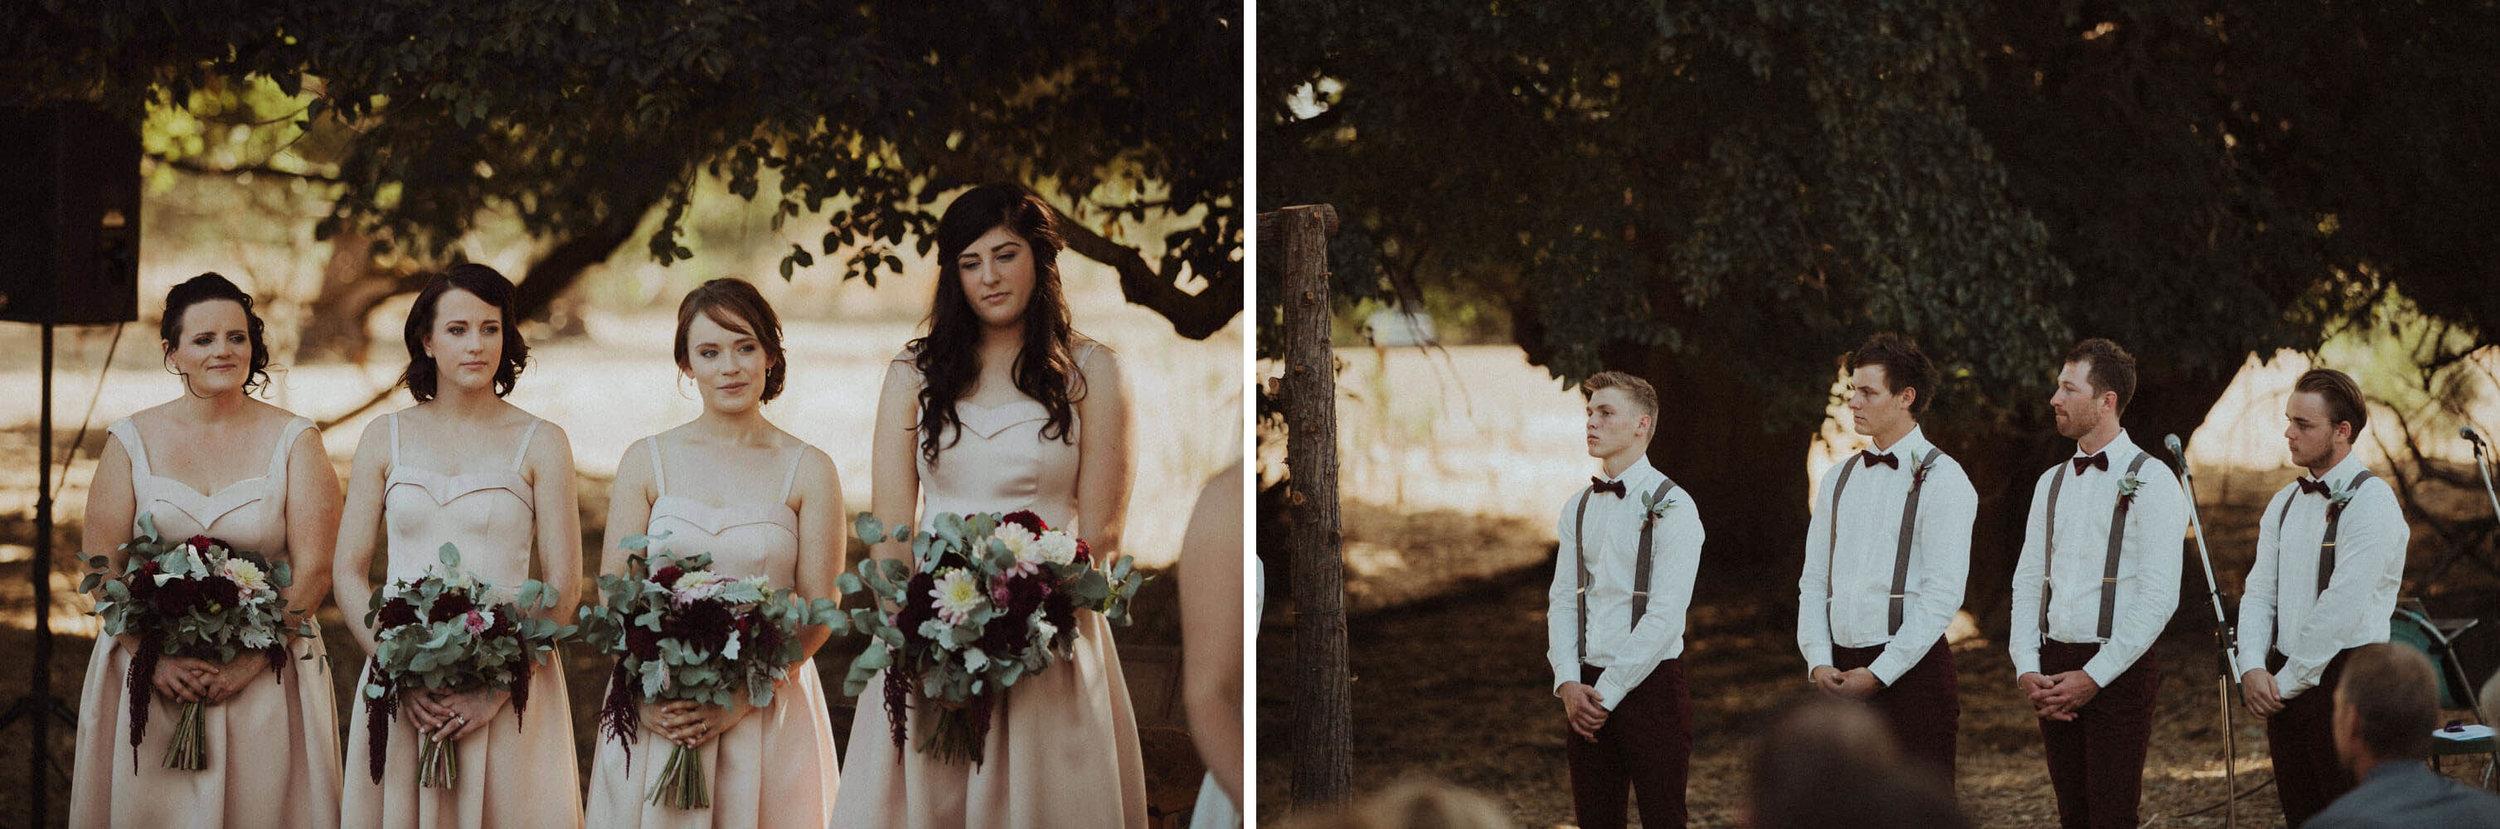 australian-wedding-photography_096(3031)2.jpg